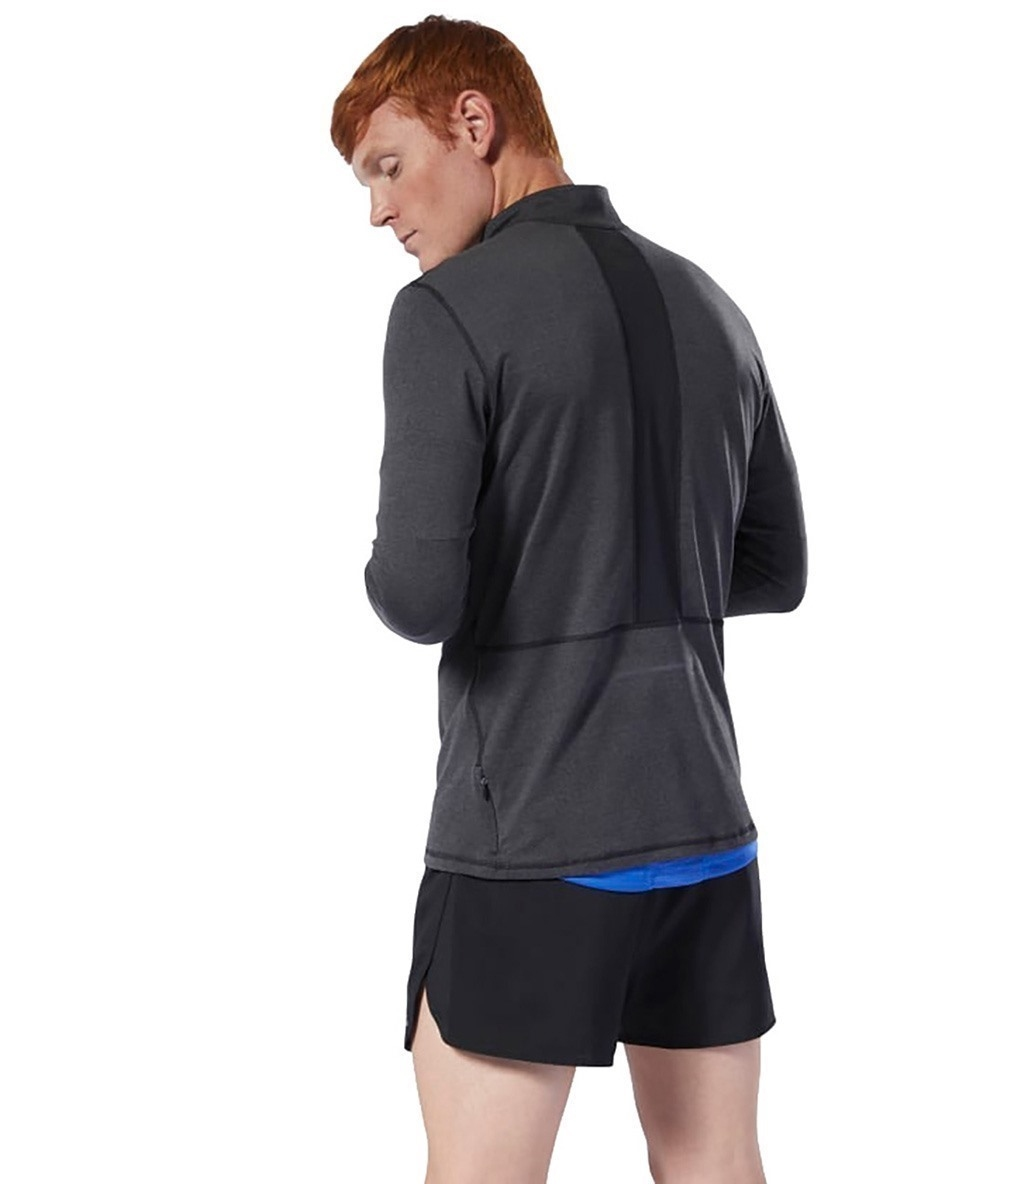 Reebok Run Essentials Yarım Fermuarlı Uzun Kollu T-Shirt Siyah